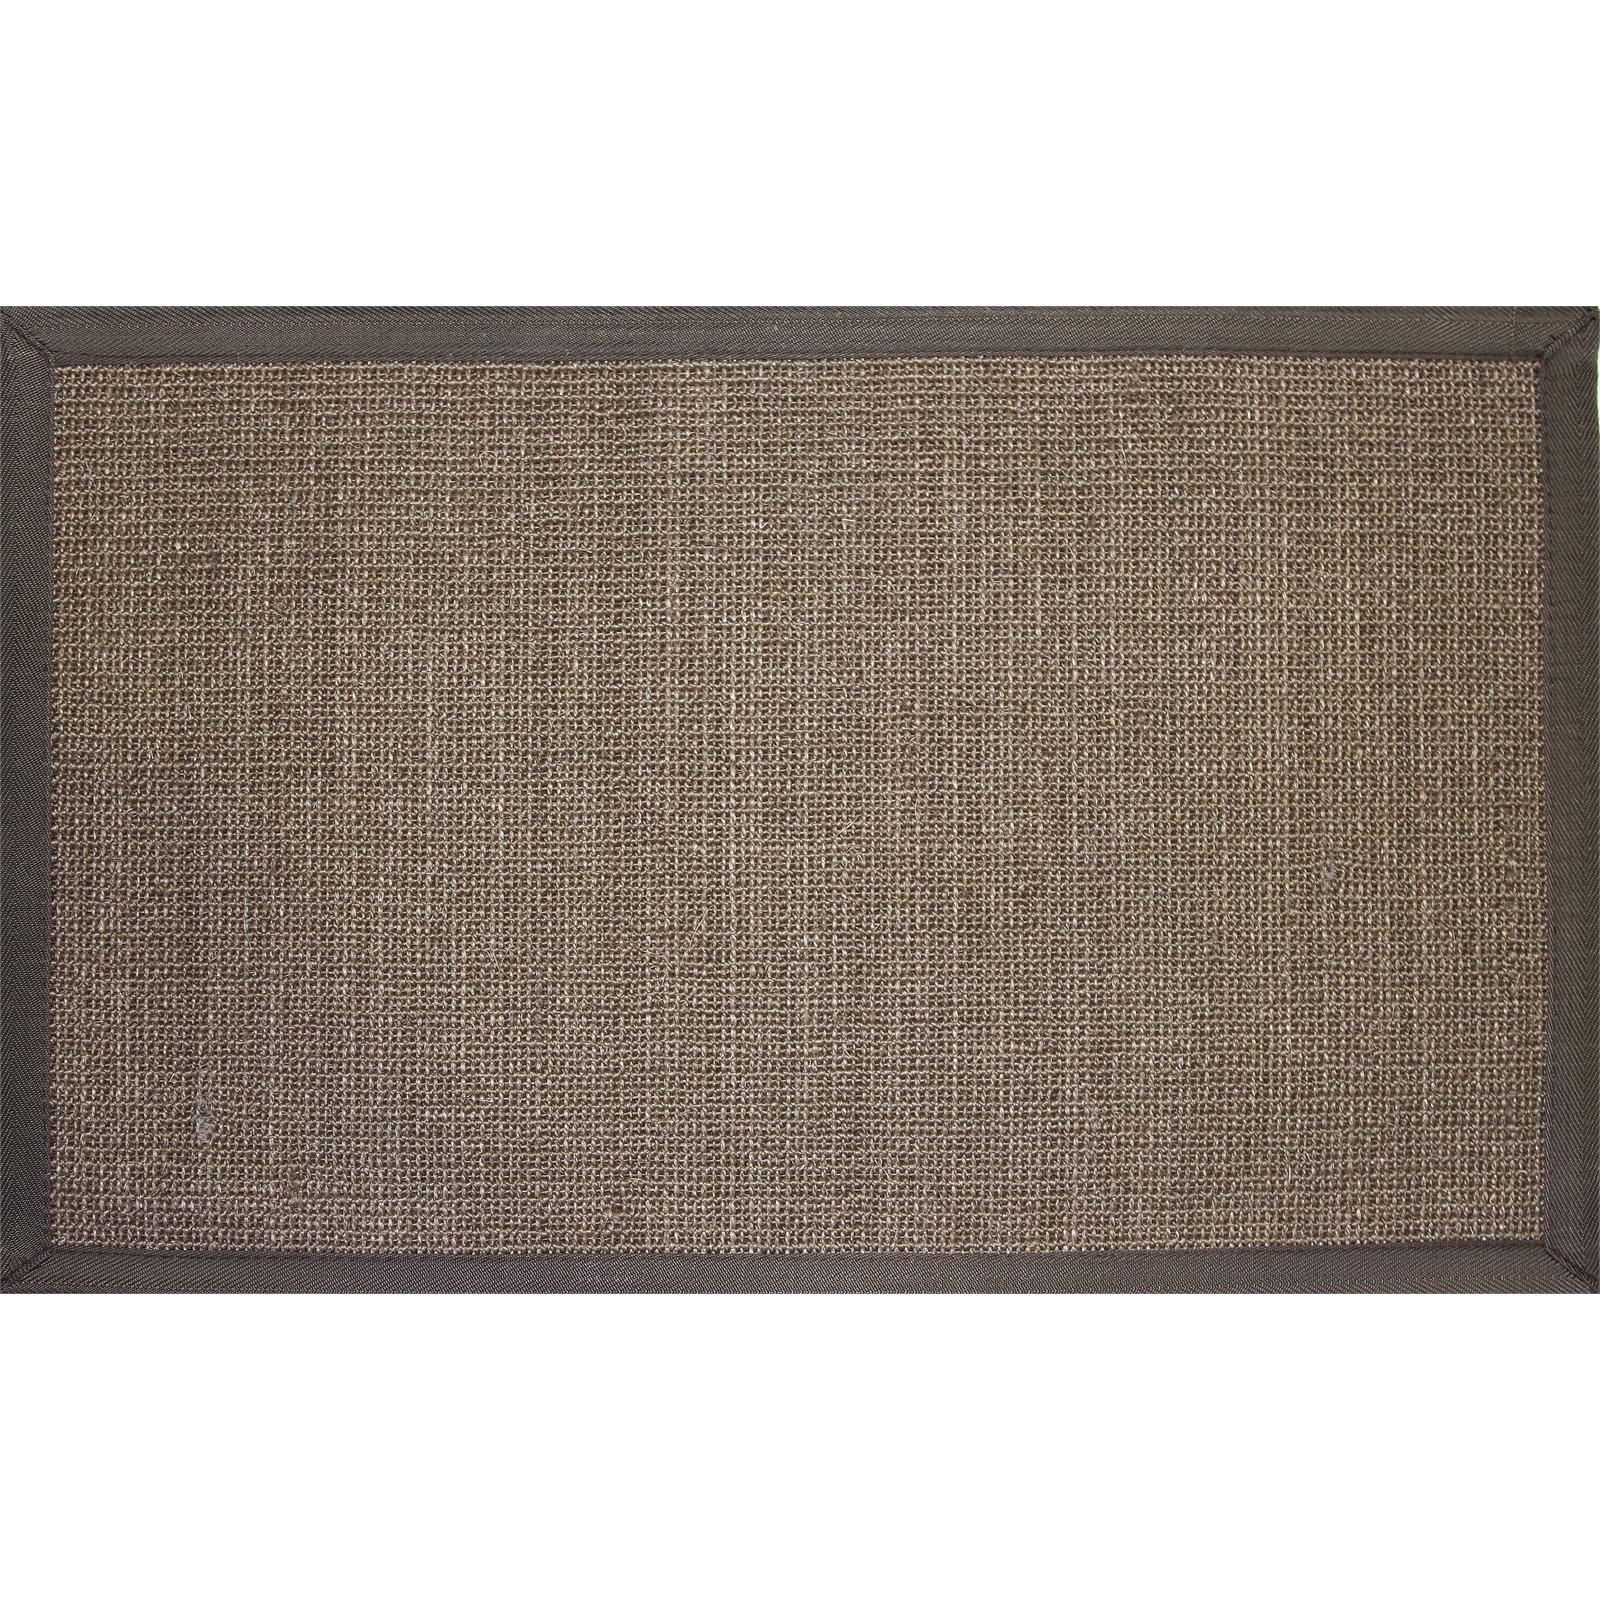 Bayliss 50 x 80cm Portsea Sisal Mat